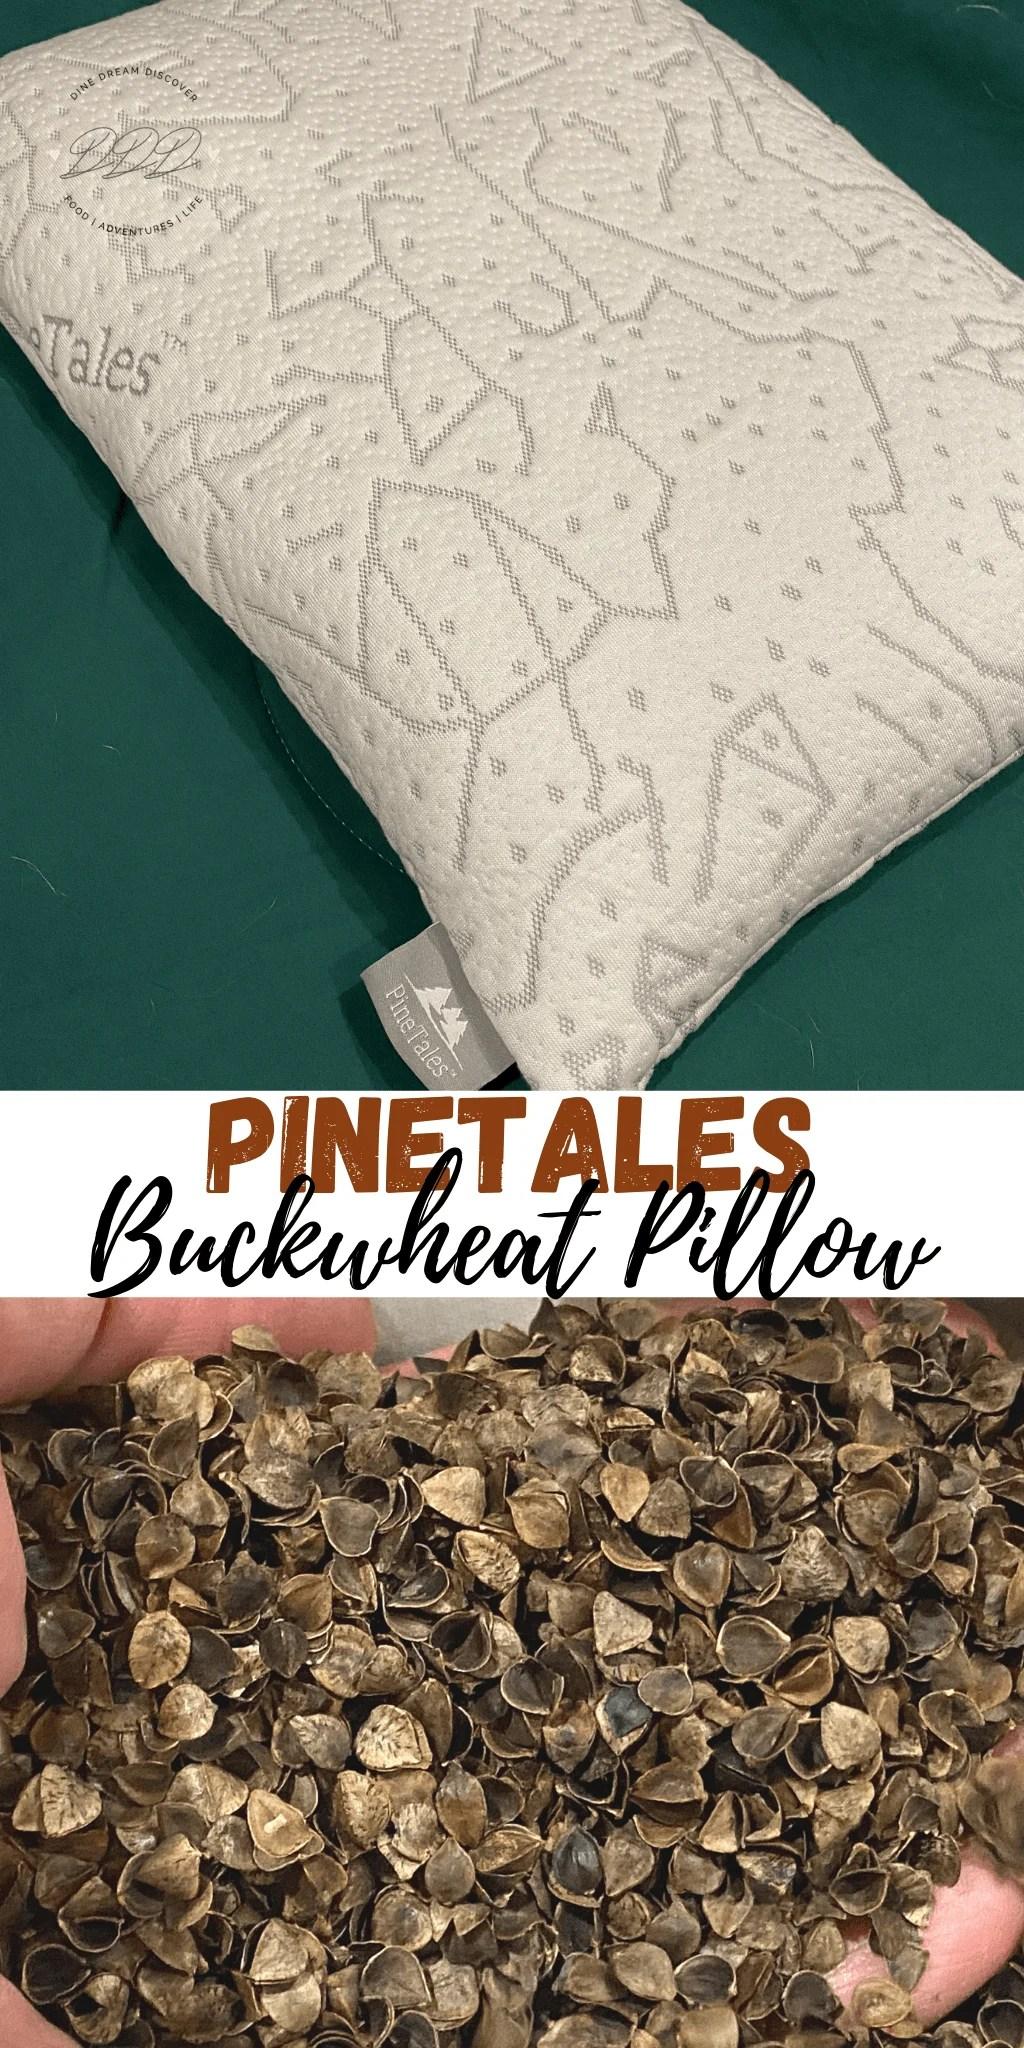 pinetales buckwheat pillow dine dream